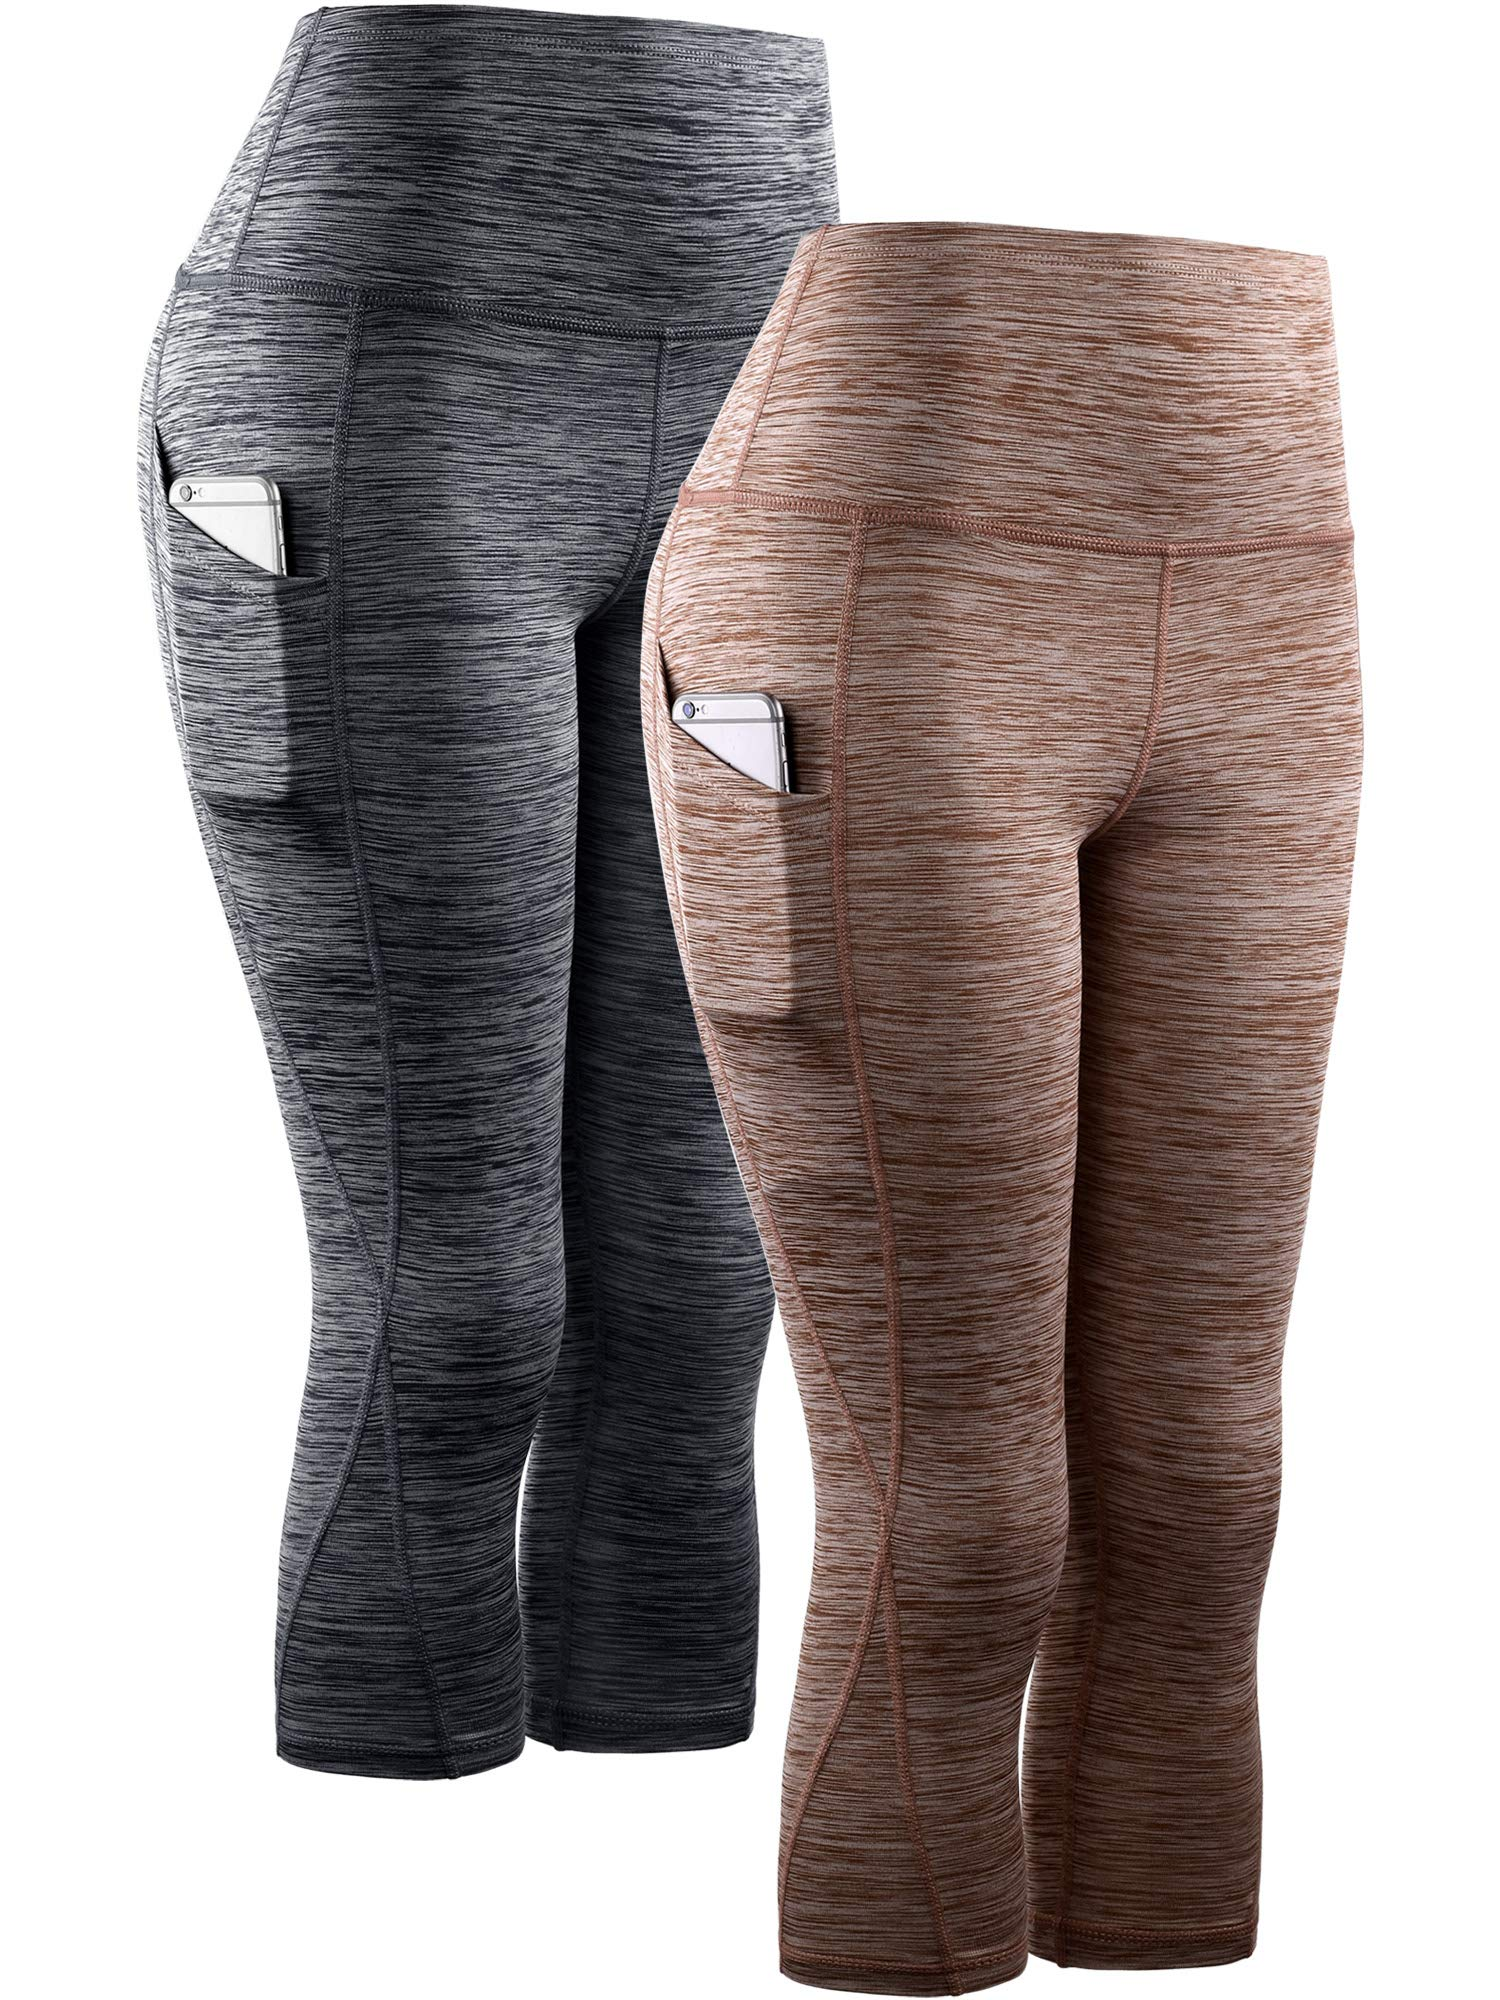 Neleus Women's 2 Pack Tummy Control High Waist Yoga Capri Leggings with Pockets,9034,Black,Brown,XL,EU 2XL by Neleus